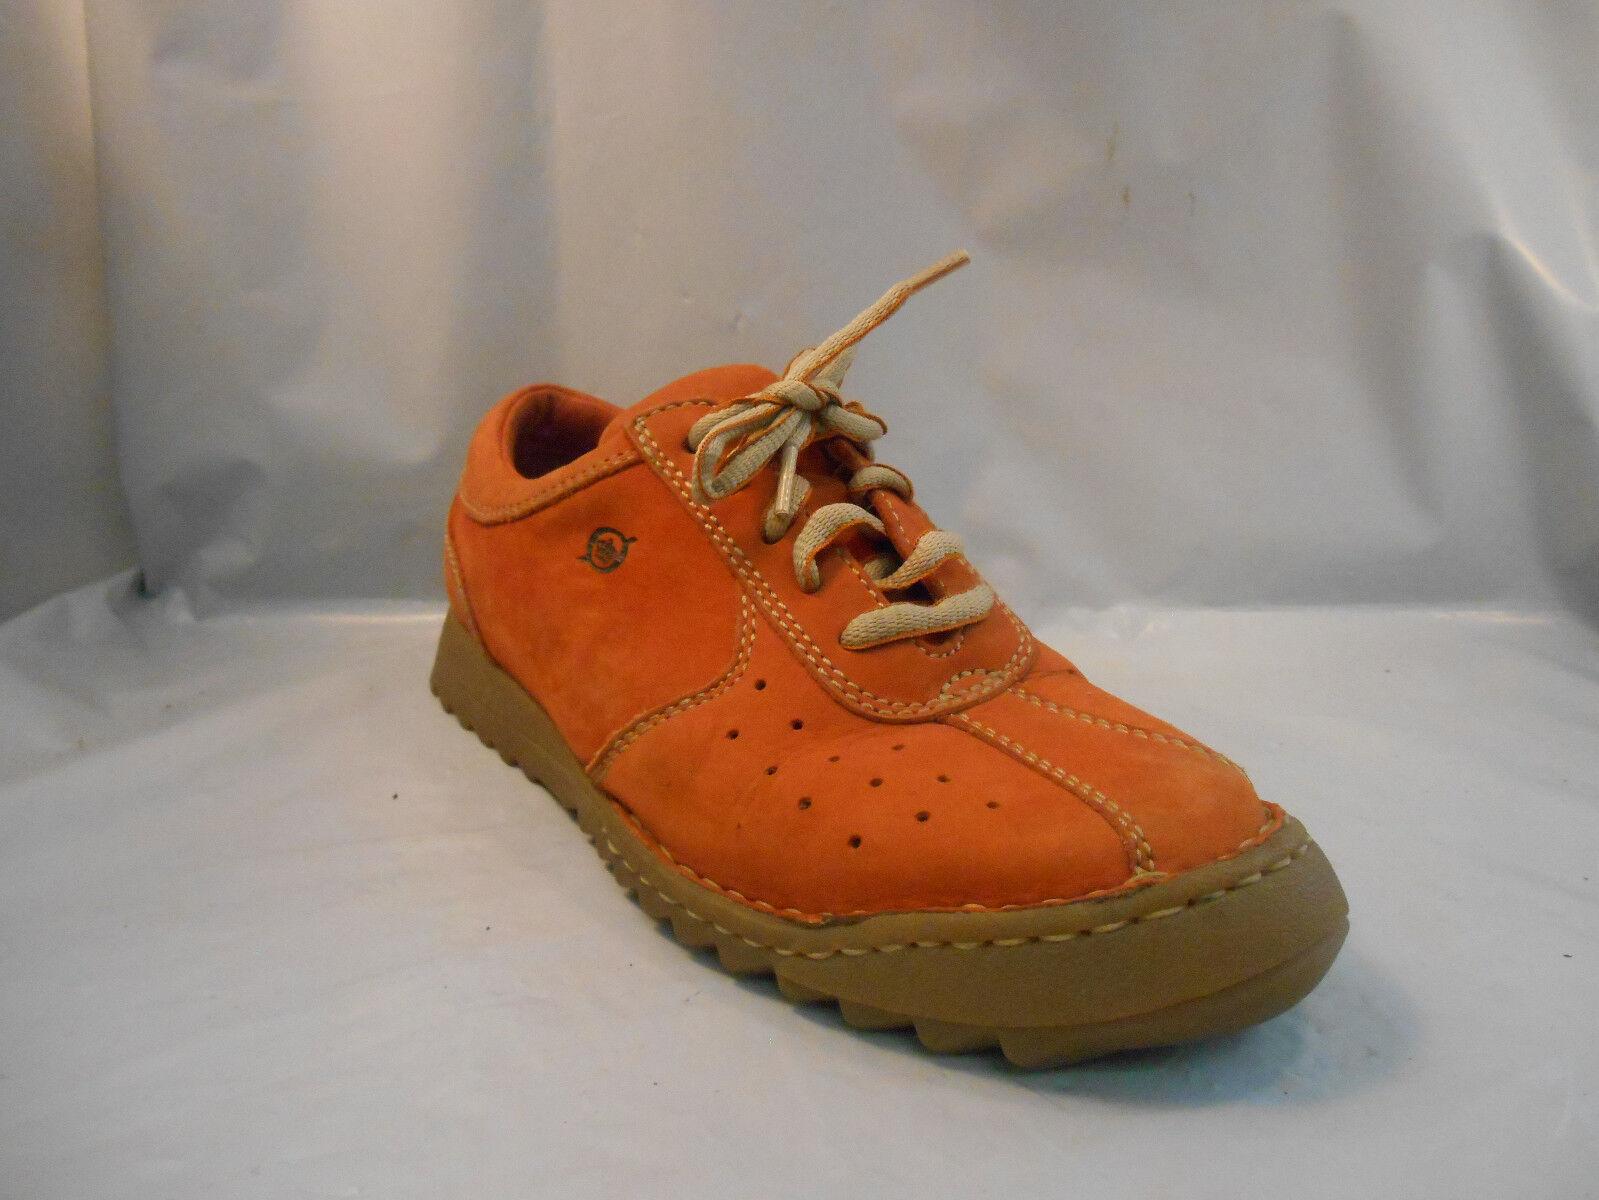 Born orange Leather Oxfords Fashion Sneakers Women's Sz 6 M   36.5 Eu